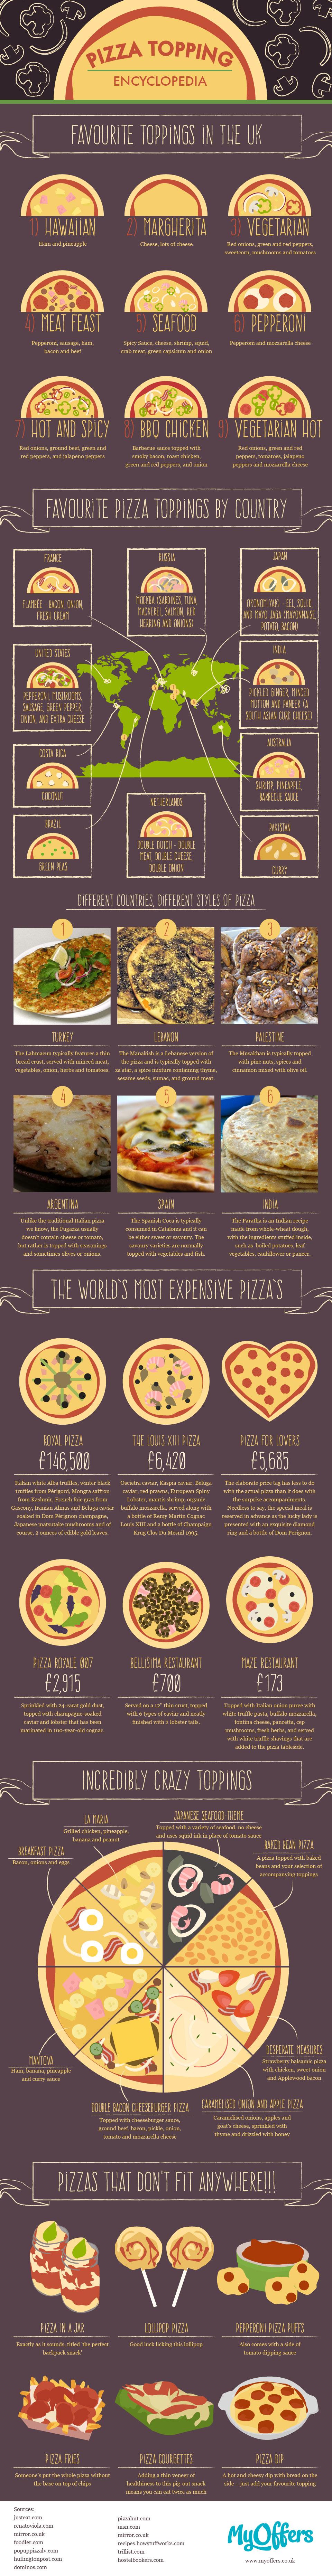 MyOffers Pizza Encyclopedia